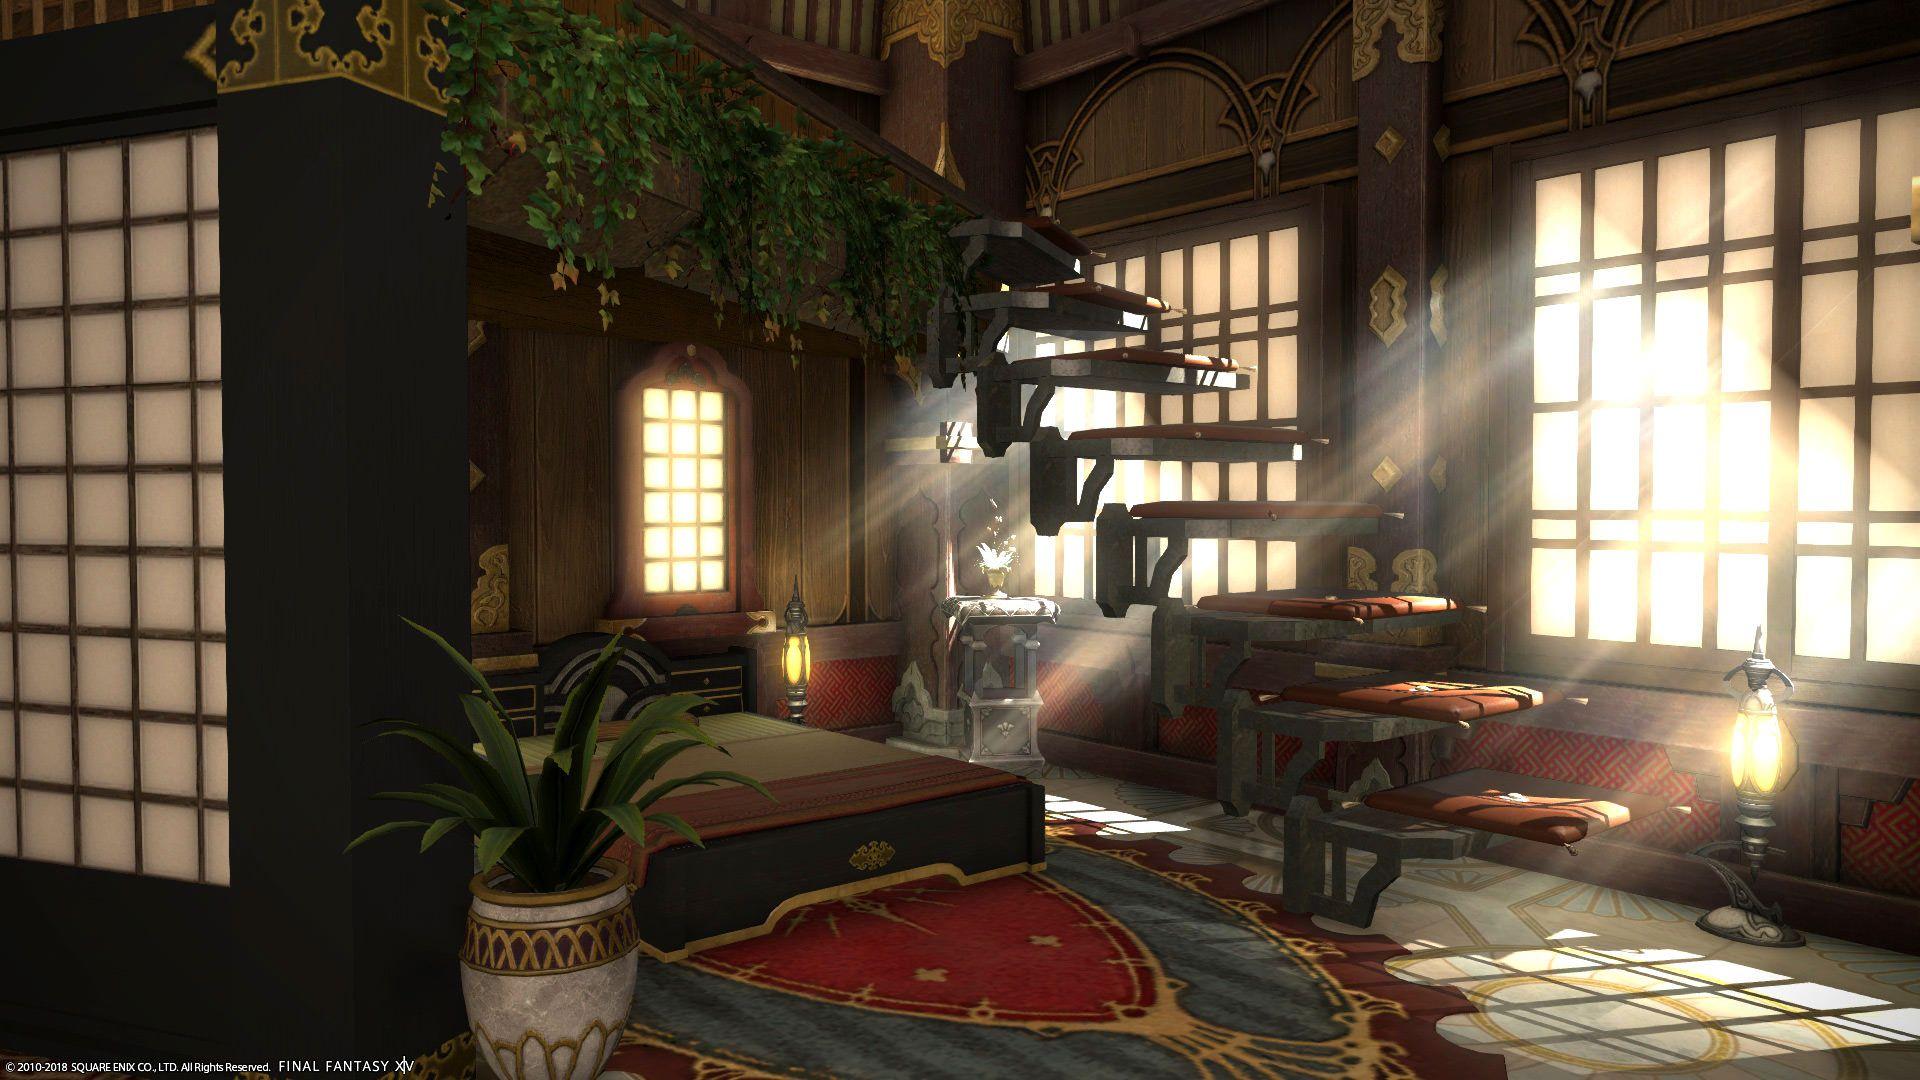 My ffxiv apartment fantasy house home decor small